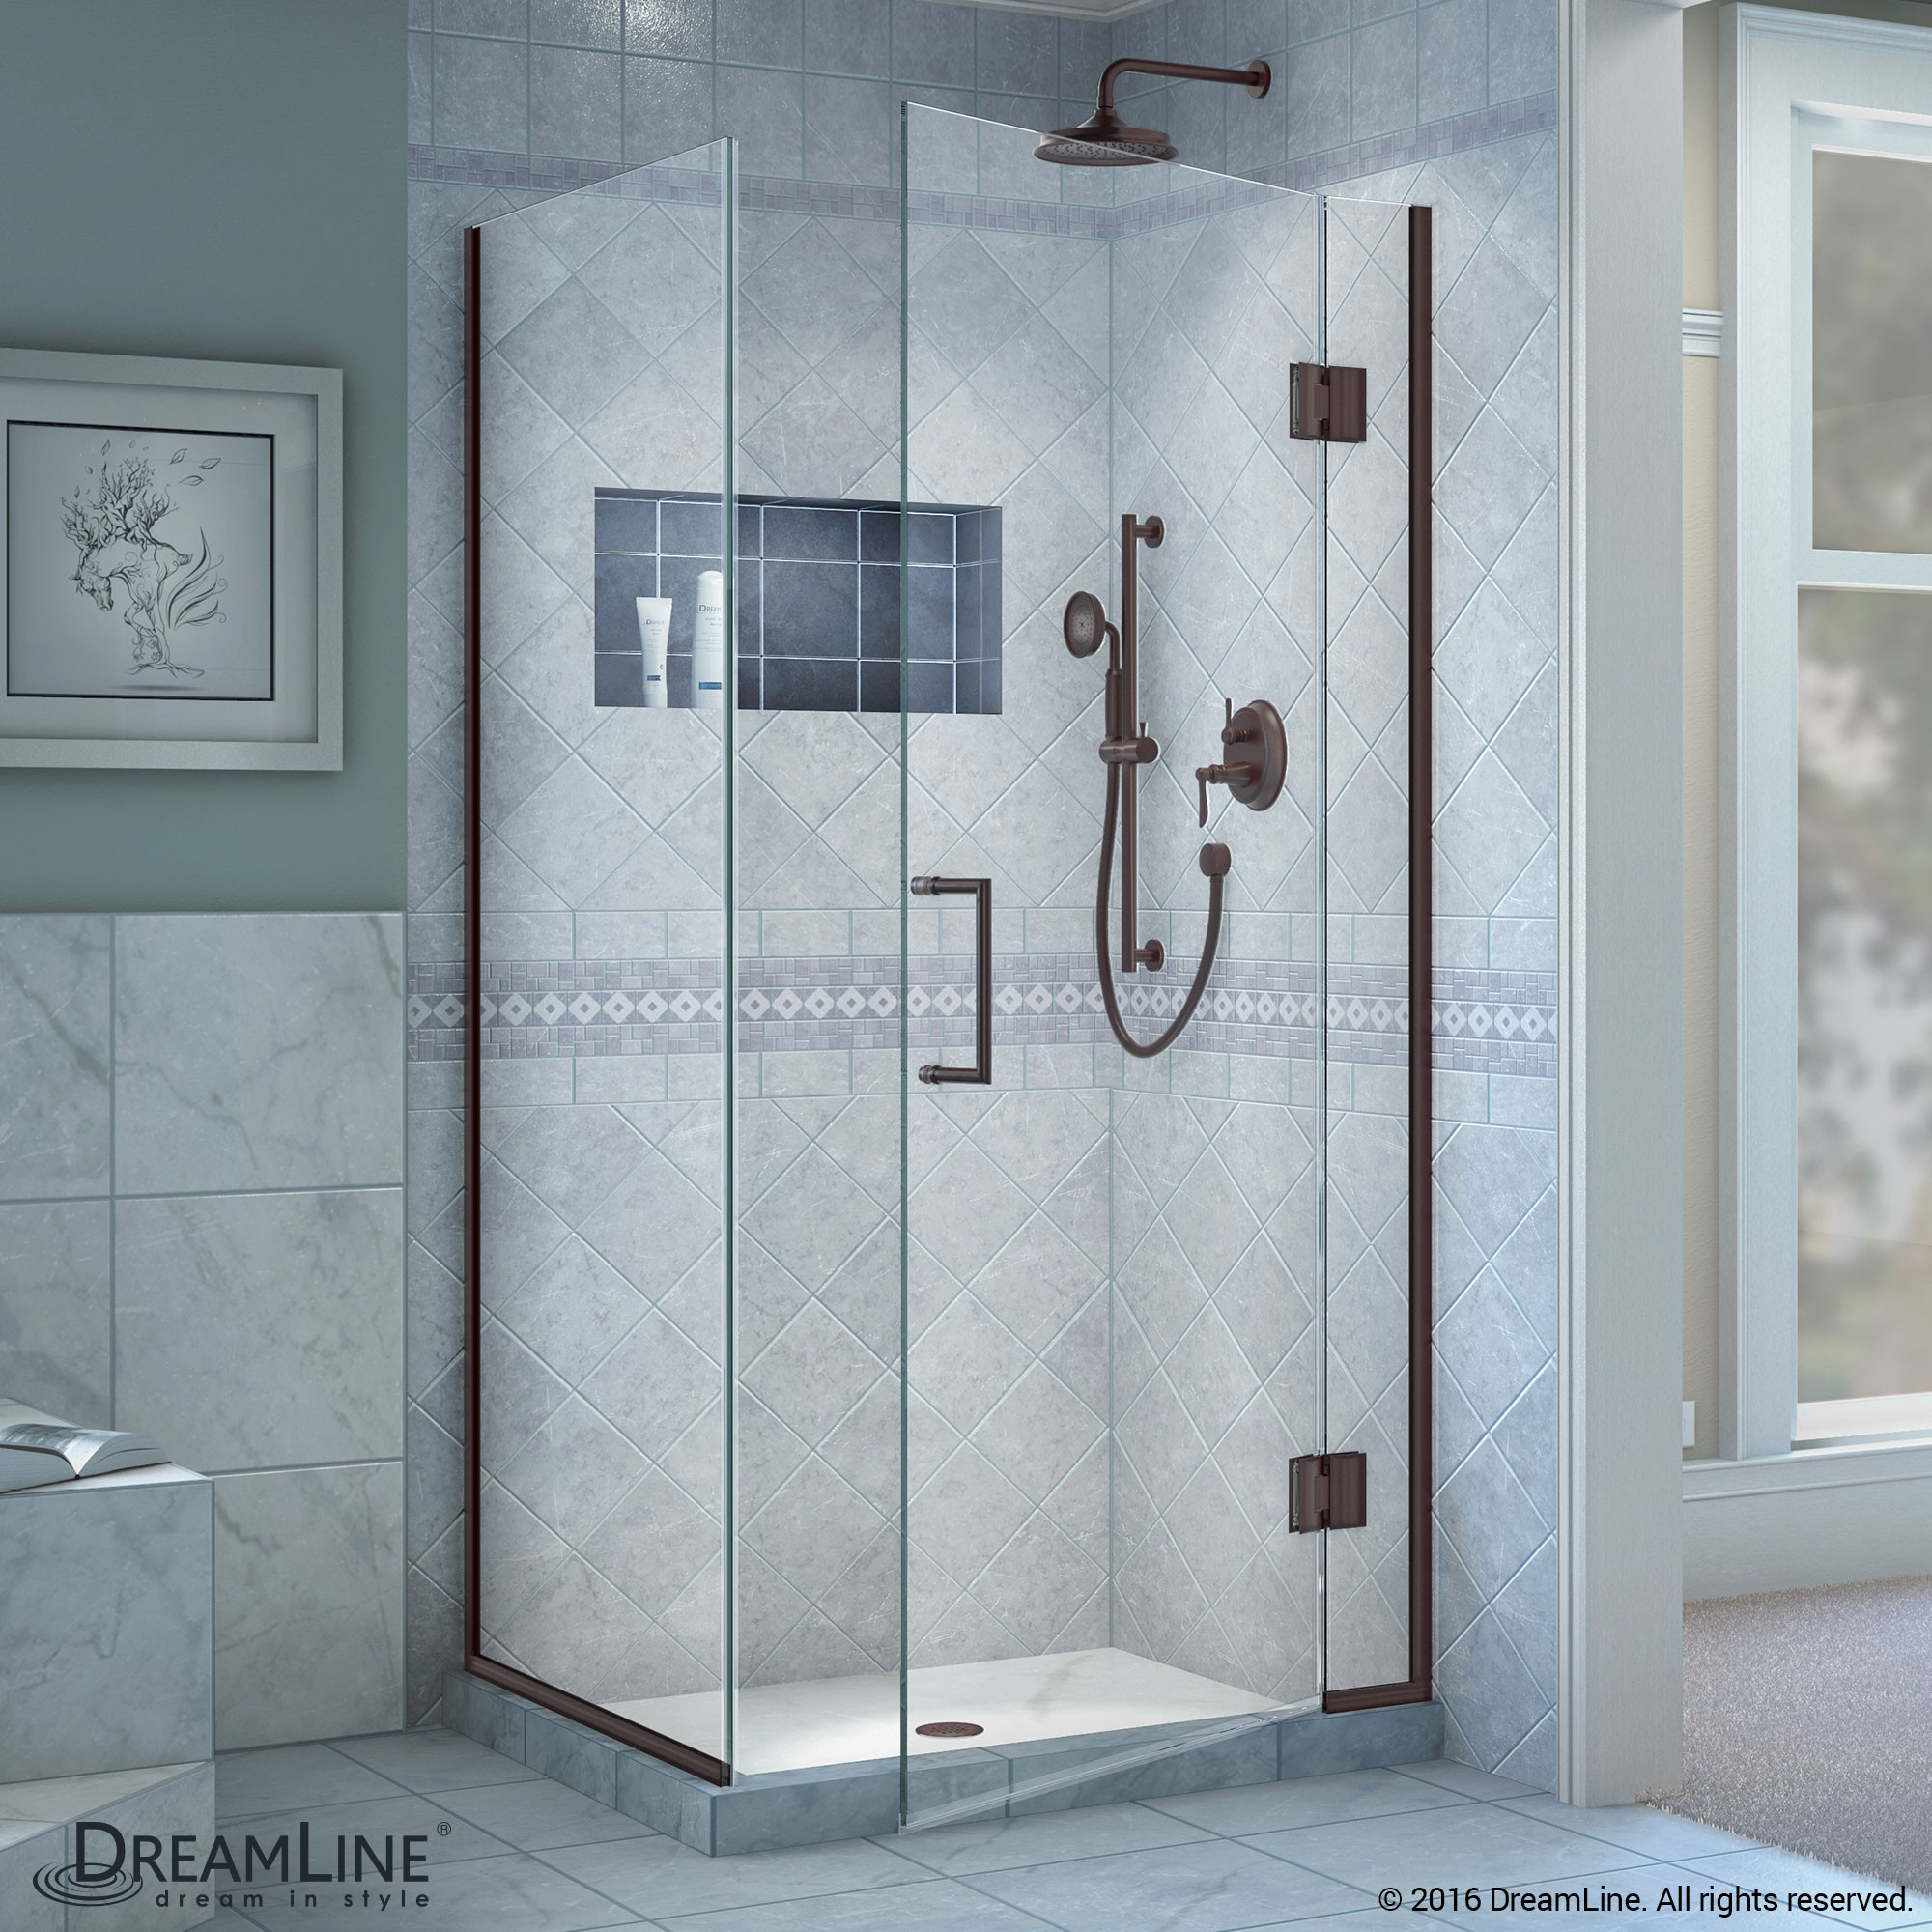 DreamLine E12834-06 Unidoor-X Hinged Shower Enclosure In Oil Rubbed Bronze Finish